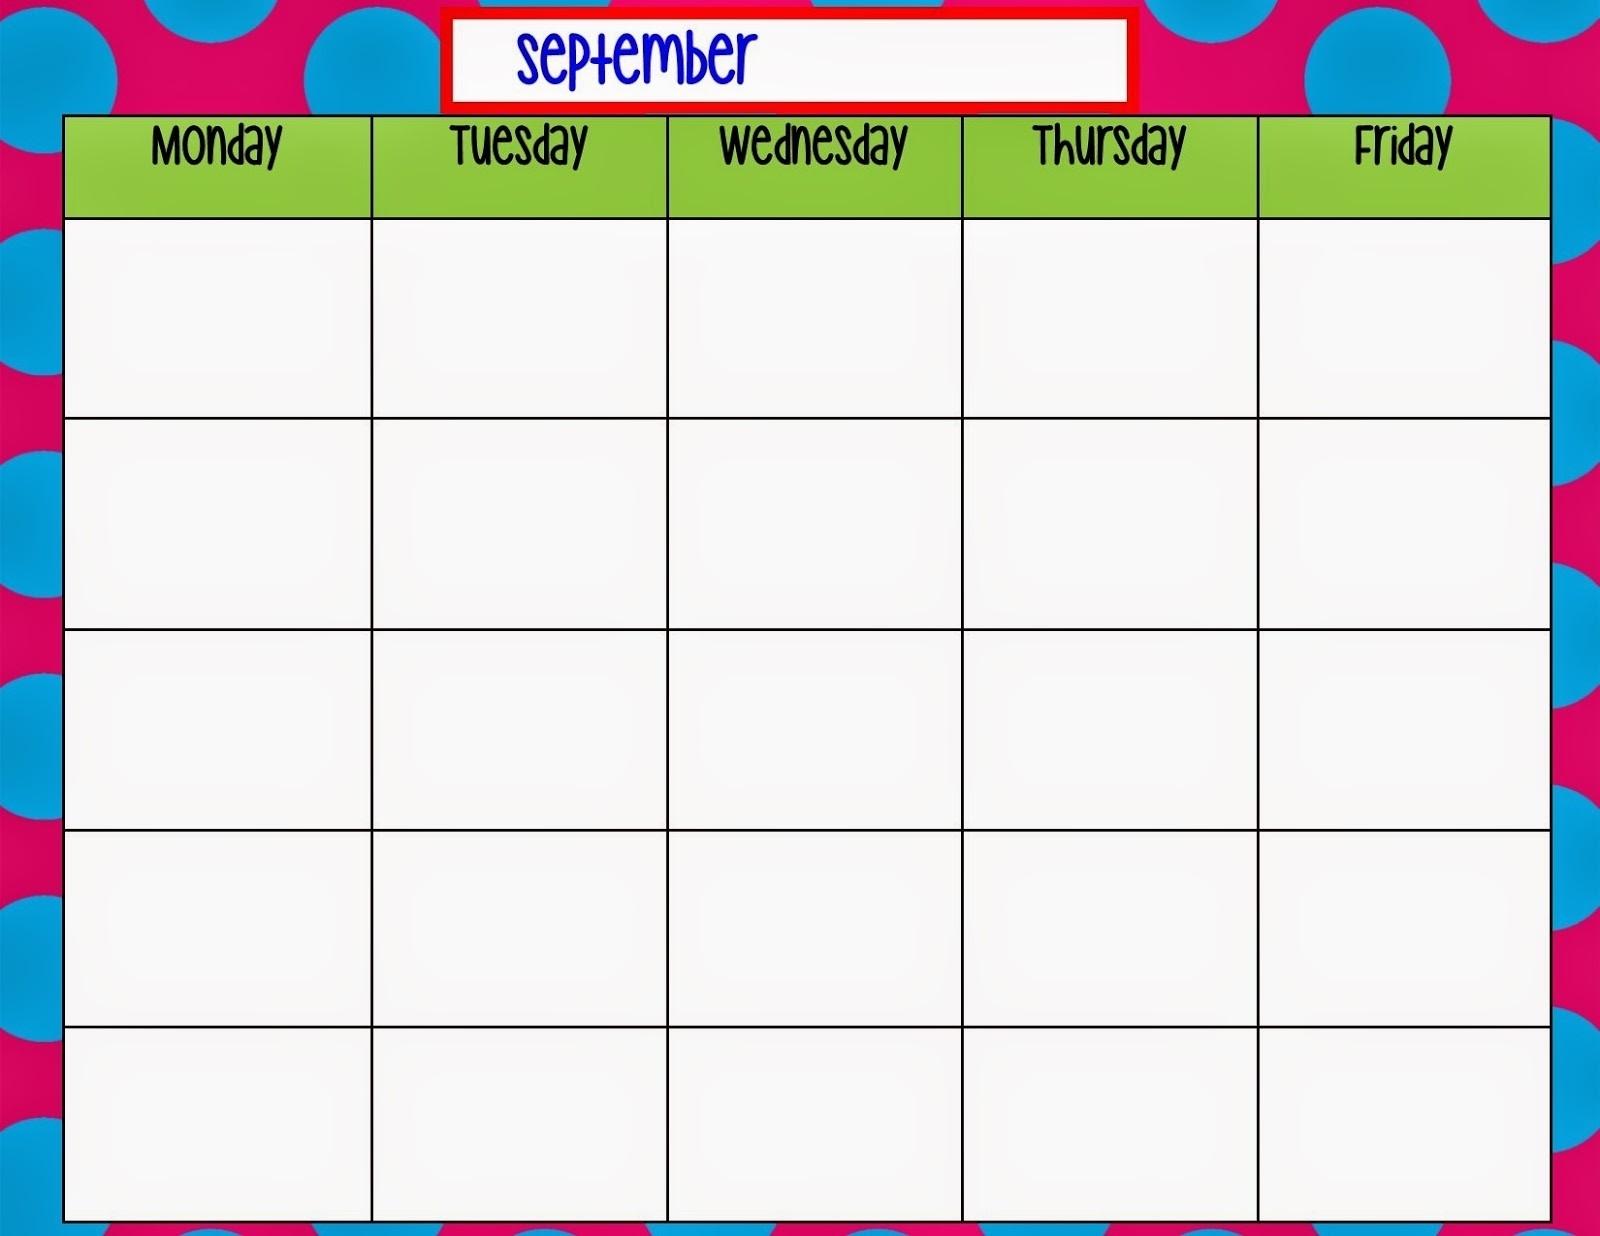 Blank Monday Through Friday Work Schedule Calendar Printable